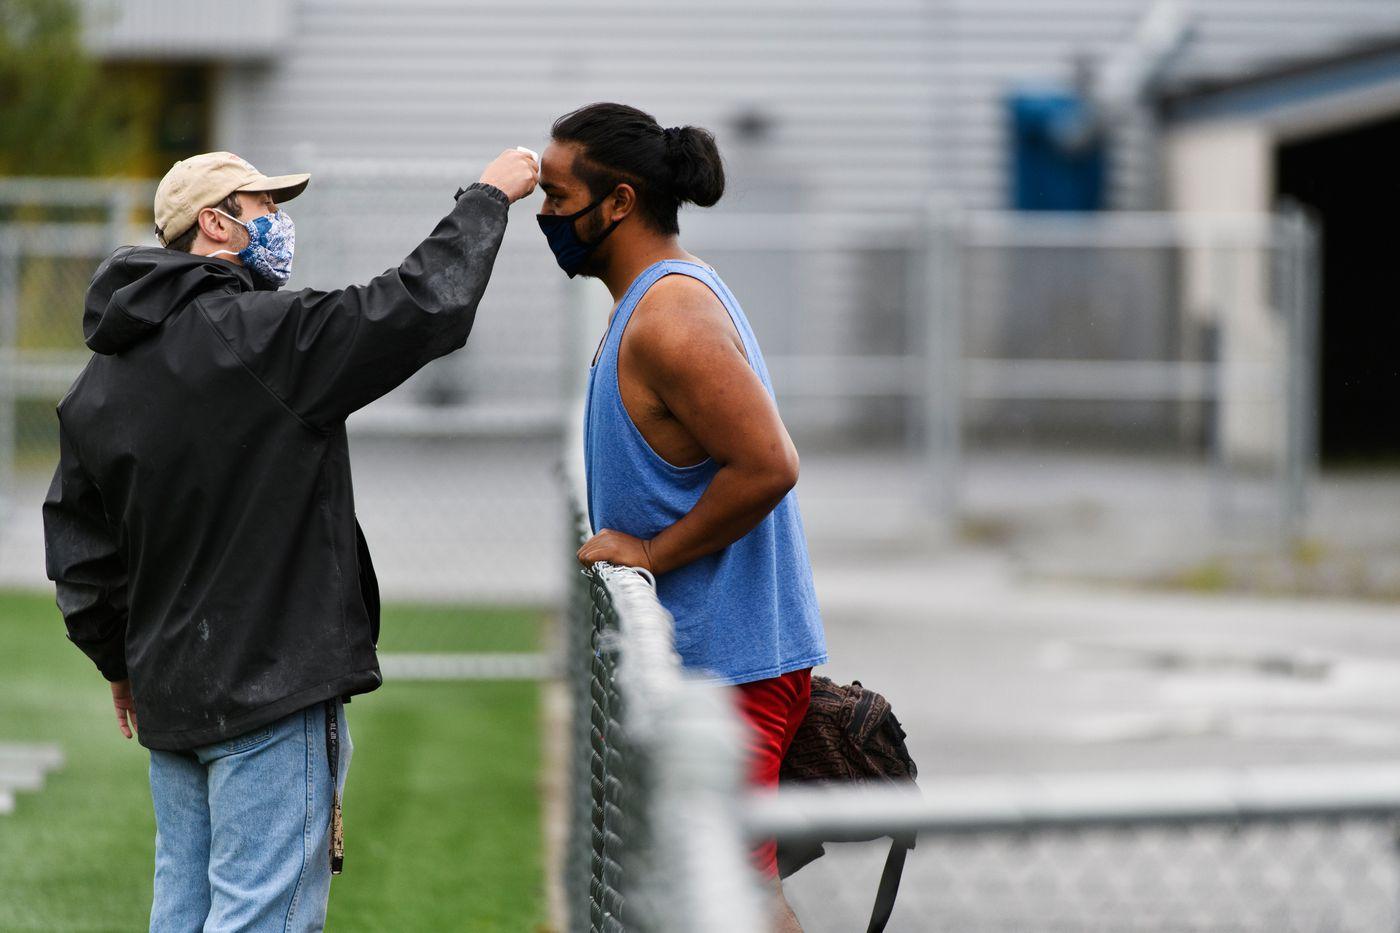 Bartlett head coach Chance Matsuoka checks the temperature of senior Edward Savelio at the start of practice on August 31, 2020. (Marc Lester / ADN)